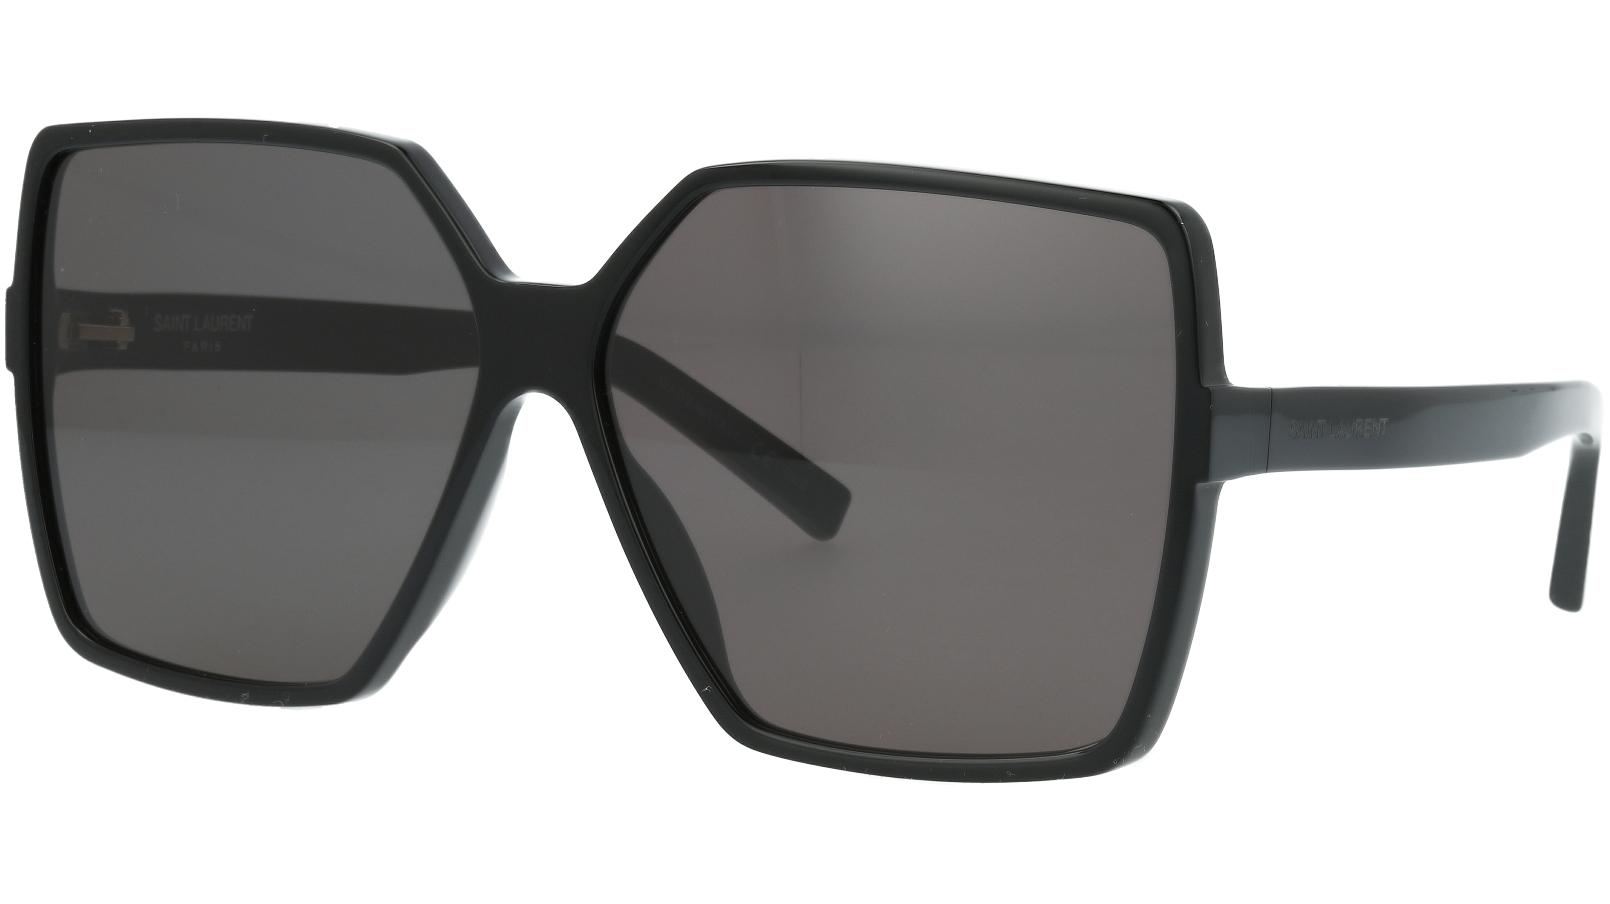 Saint Laurent SL232 BETTY 001 63 Black Sunglasses